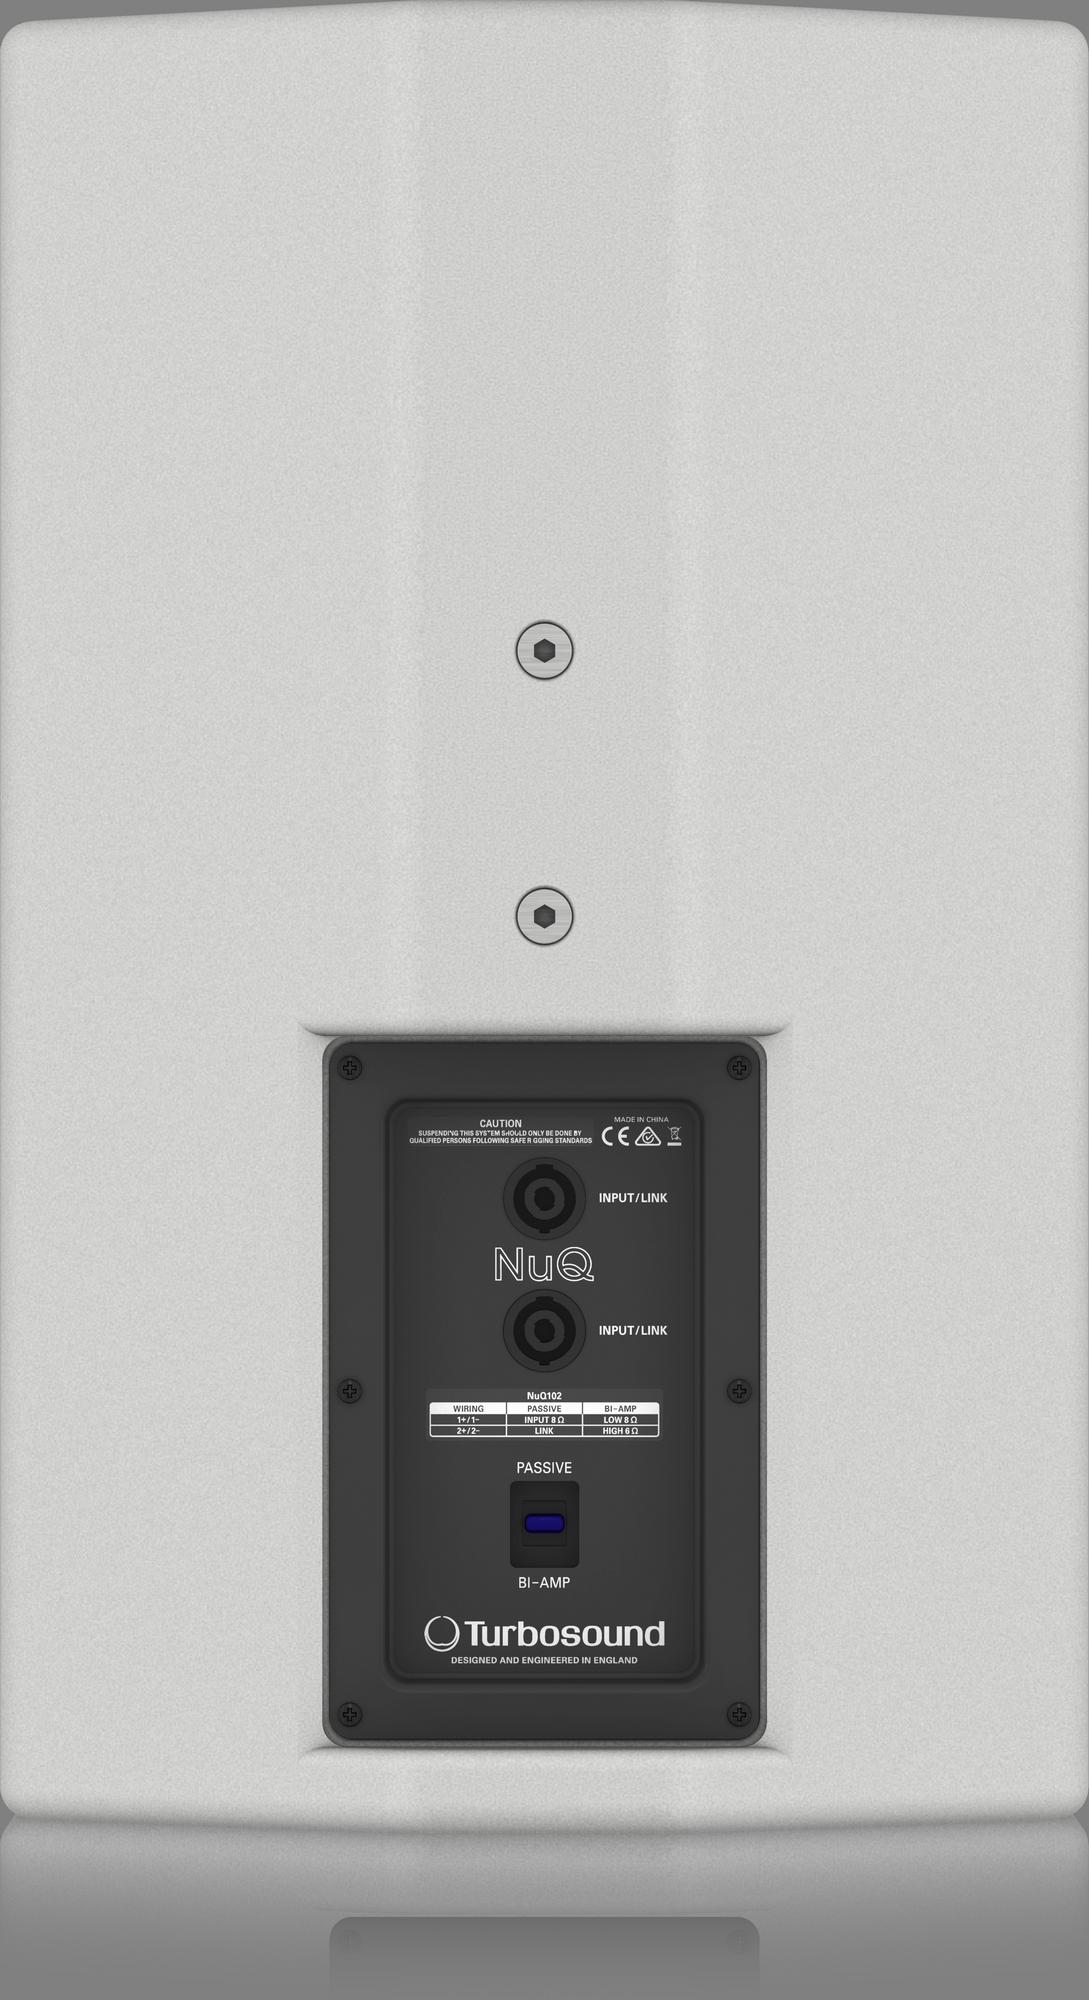 Turbosound  NuQ102-WH - Loudspeaker